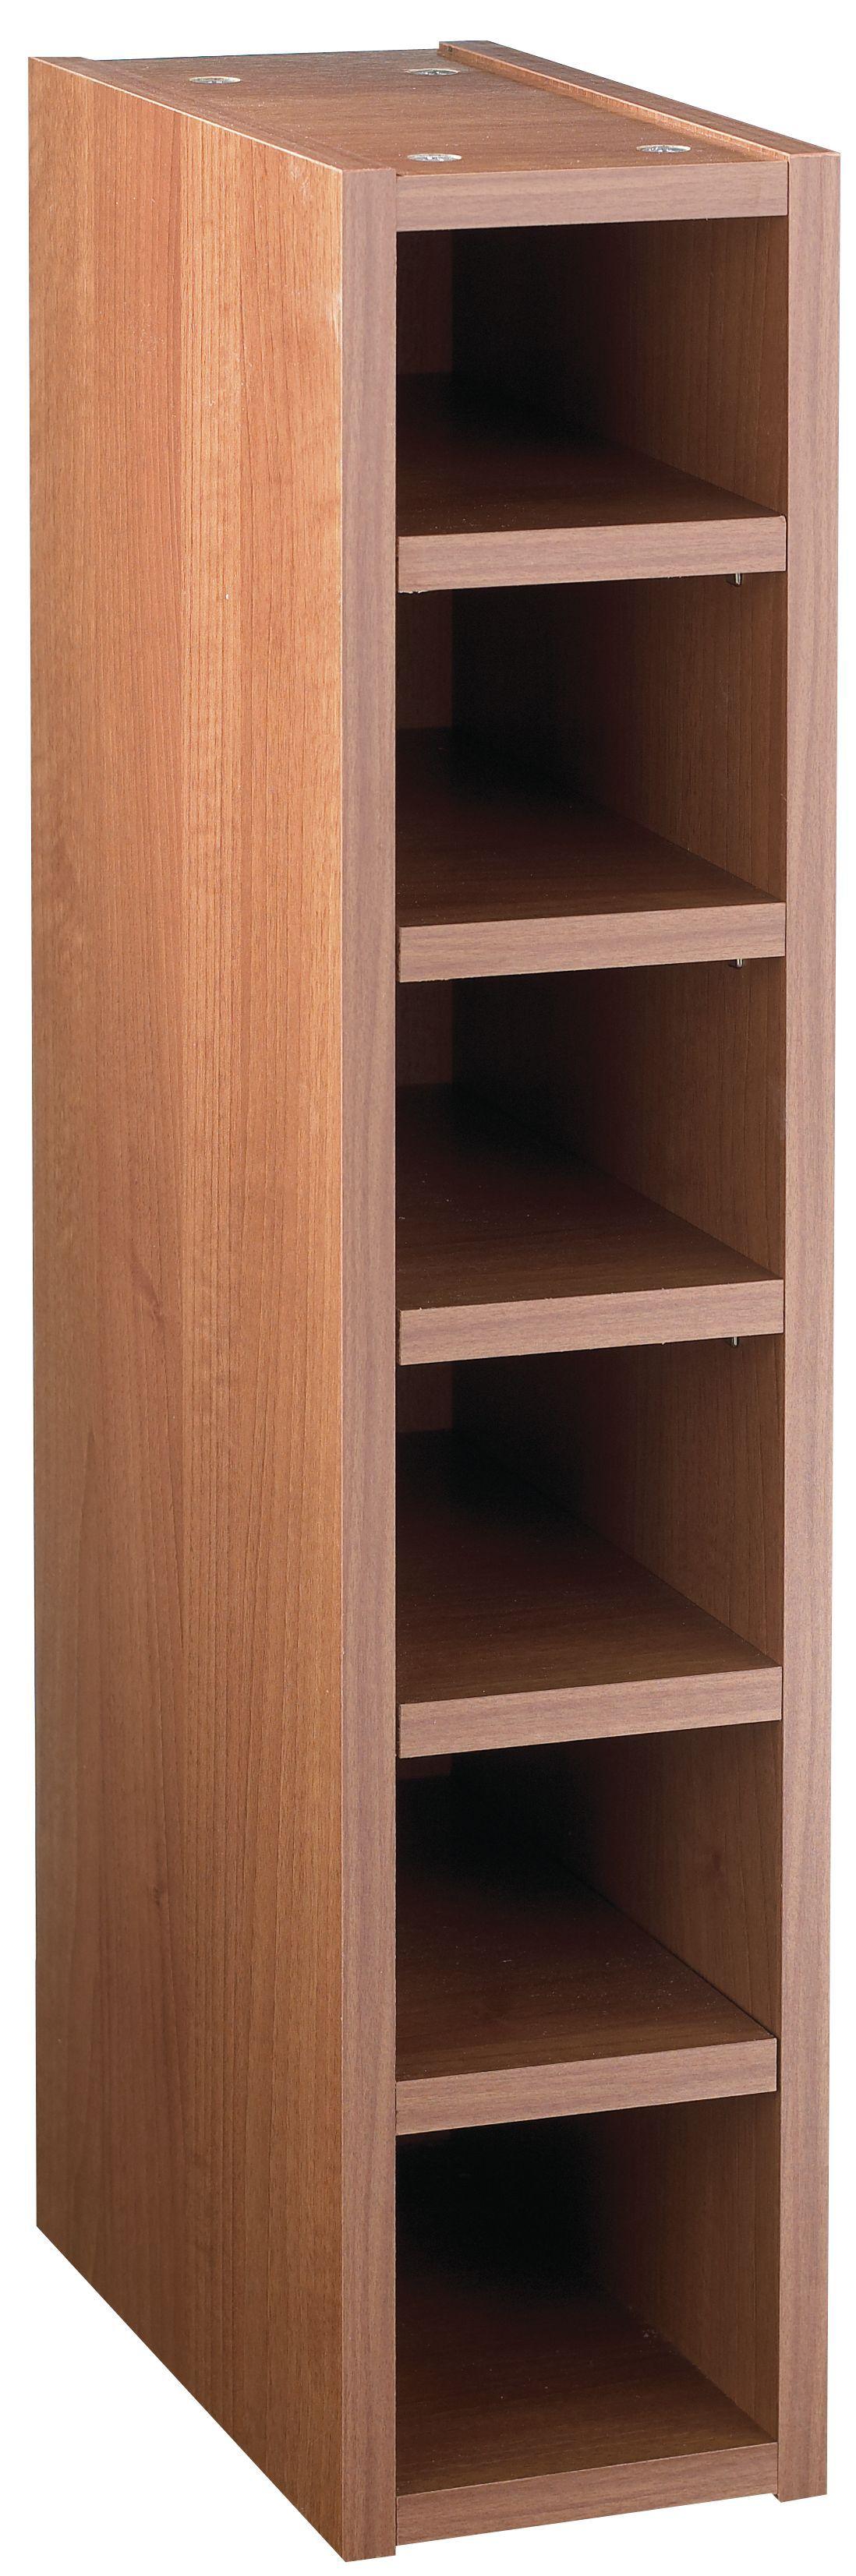 IT Kitchens Walnut Effect Wine Rack Cabinet W 150mm